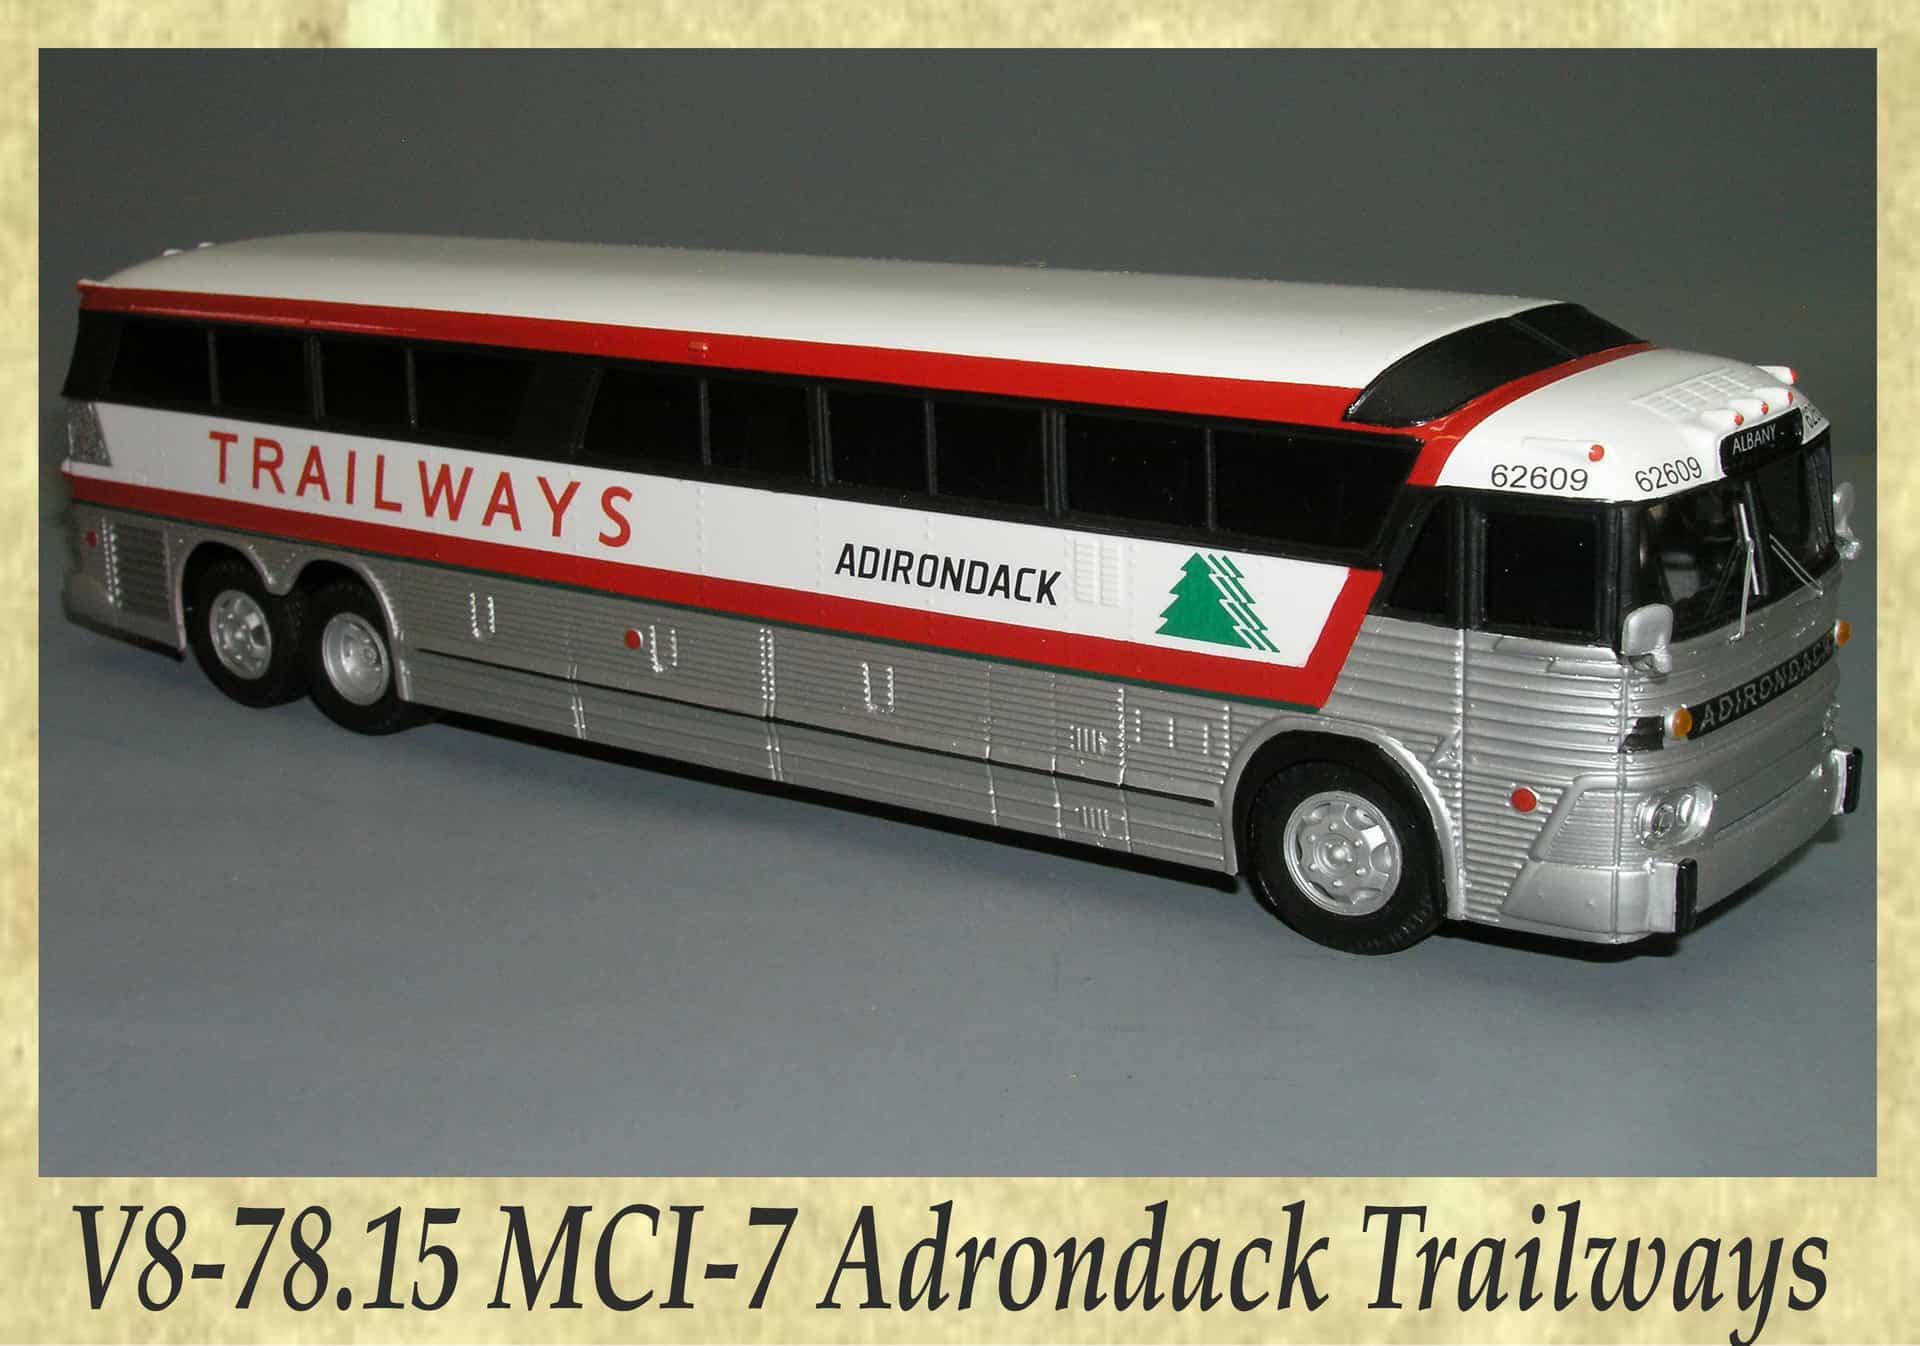 V8-78.15 MCI-7 Adrondack Trailways